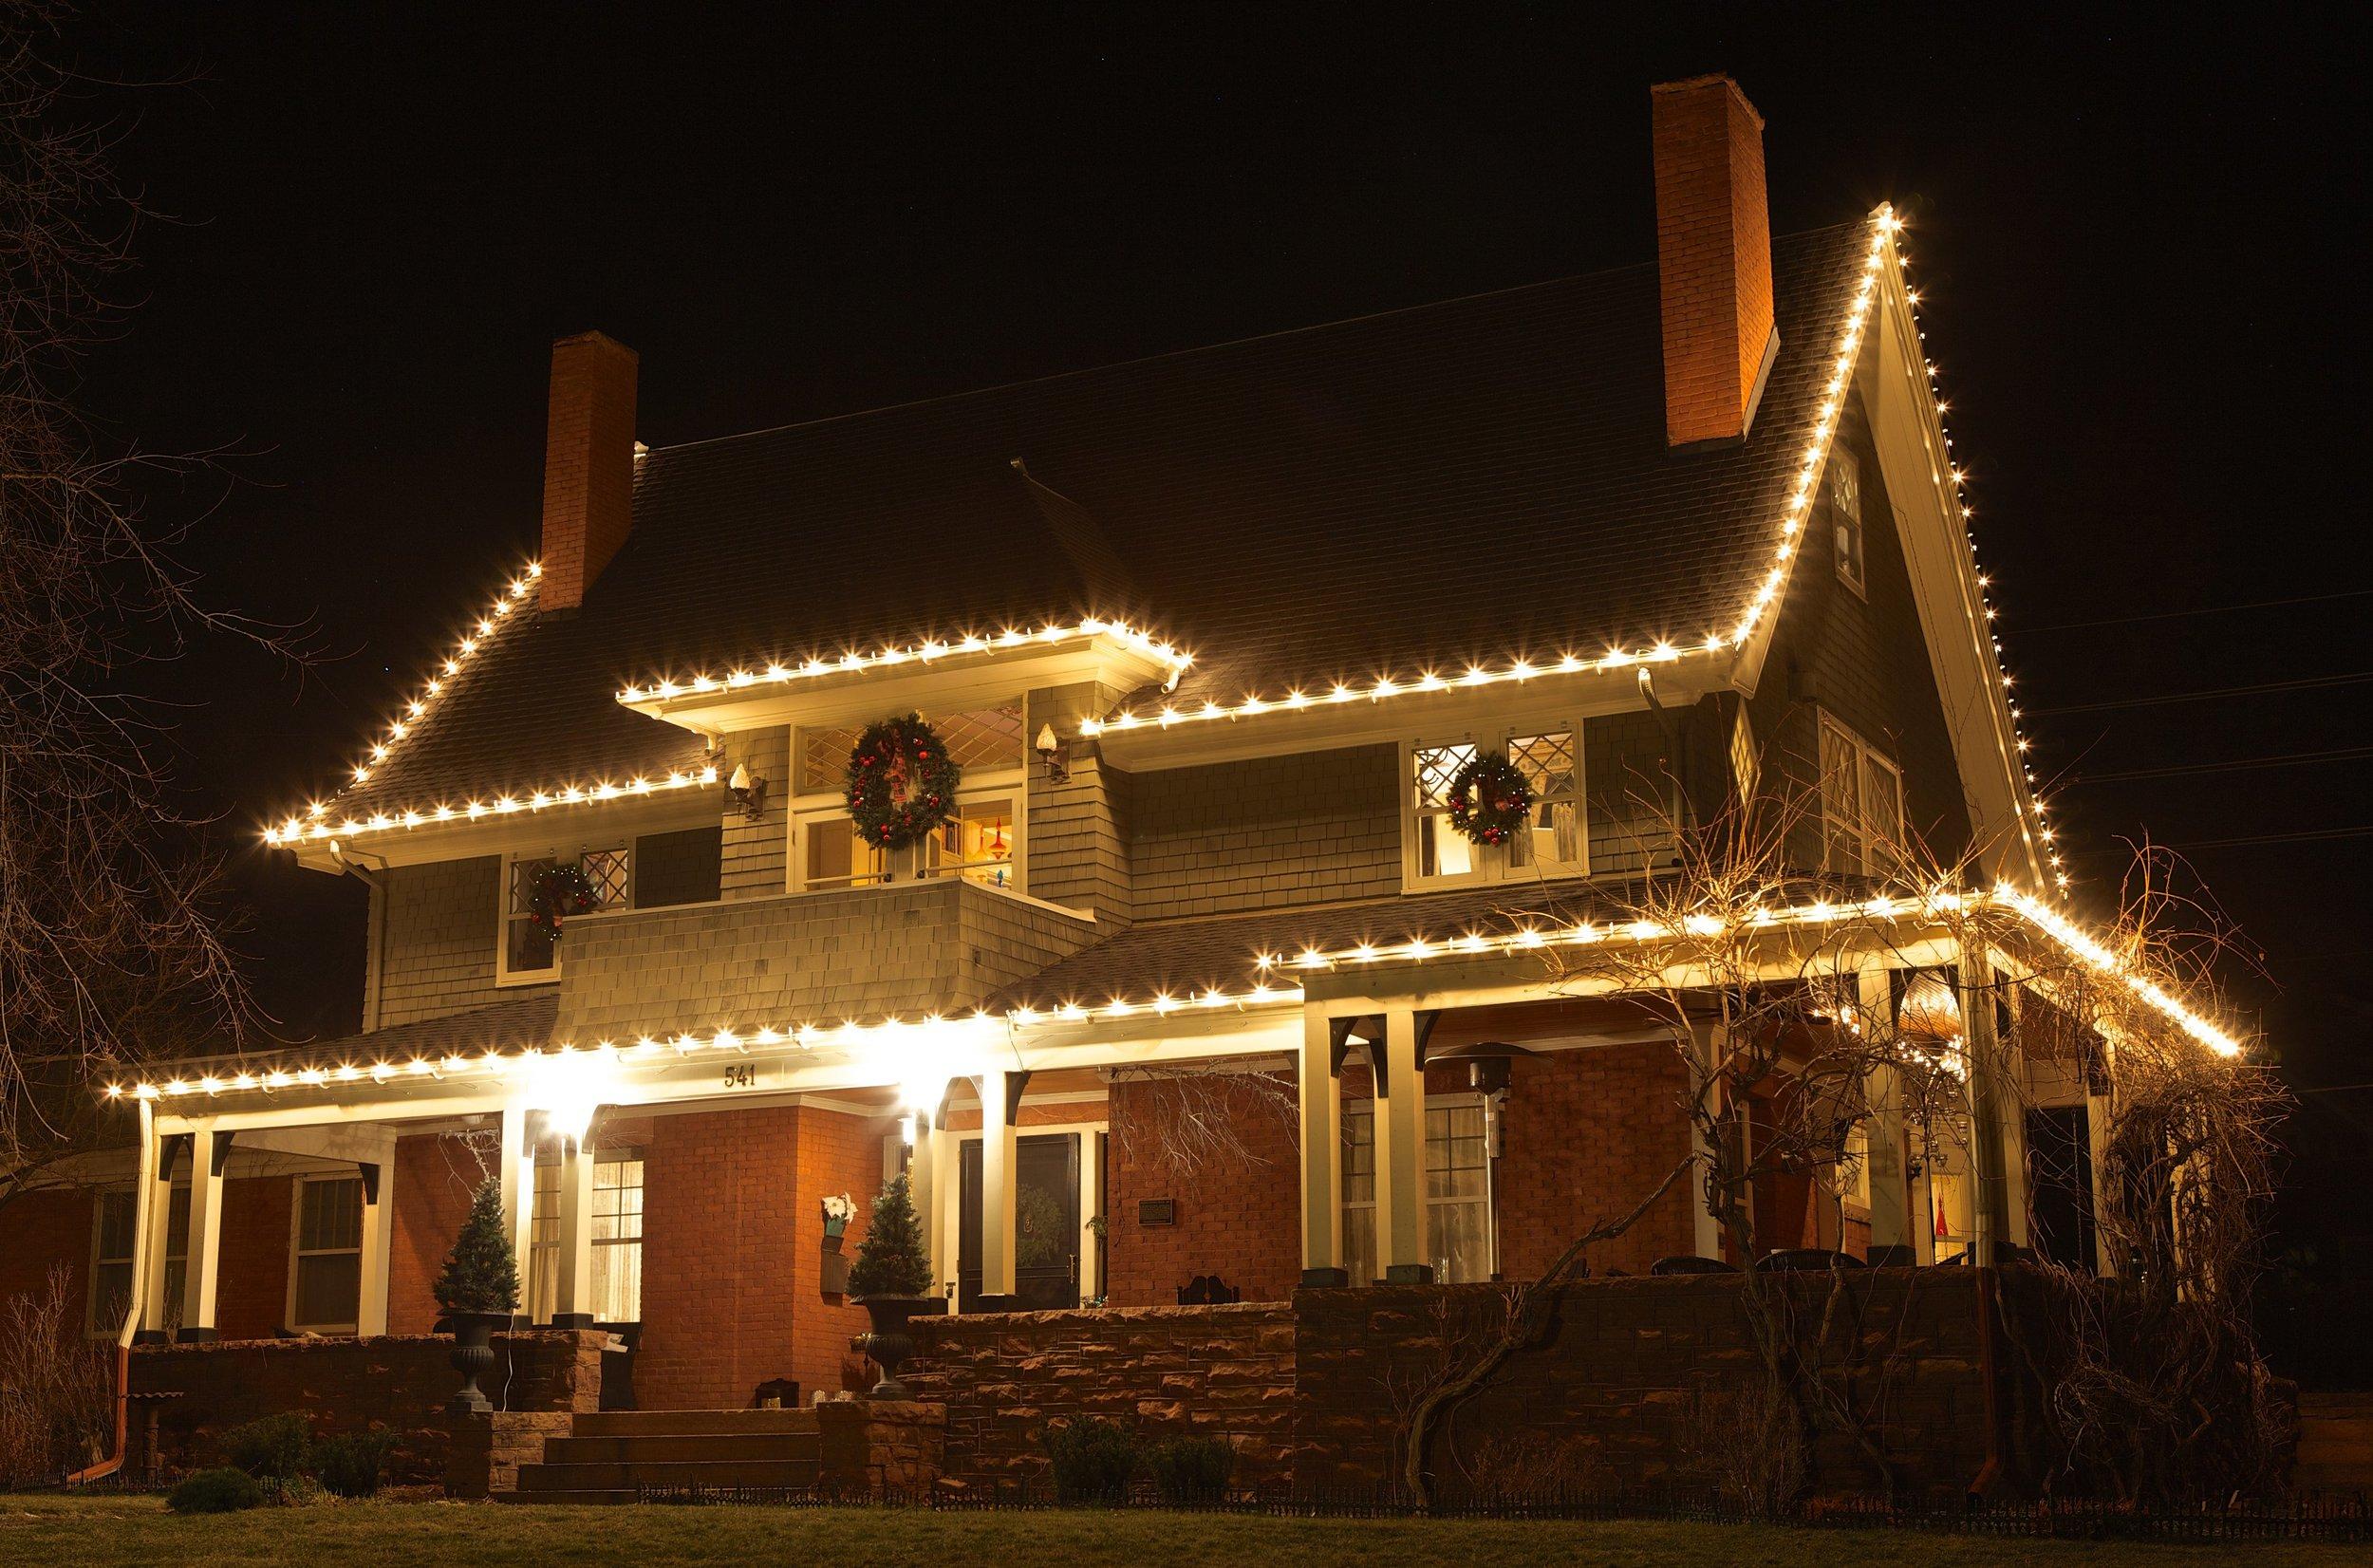 Lights-Up-2014-11.jpg